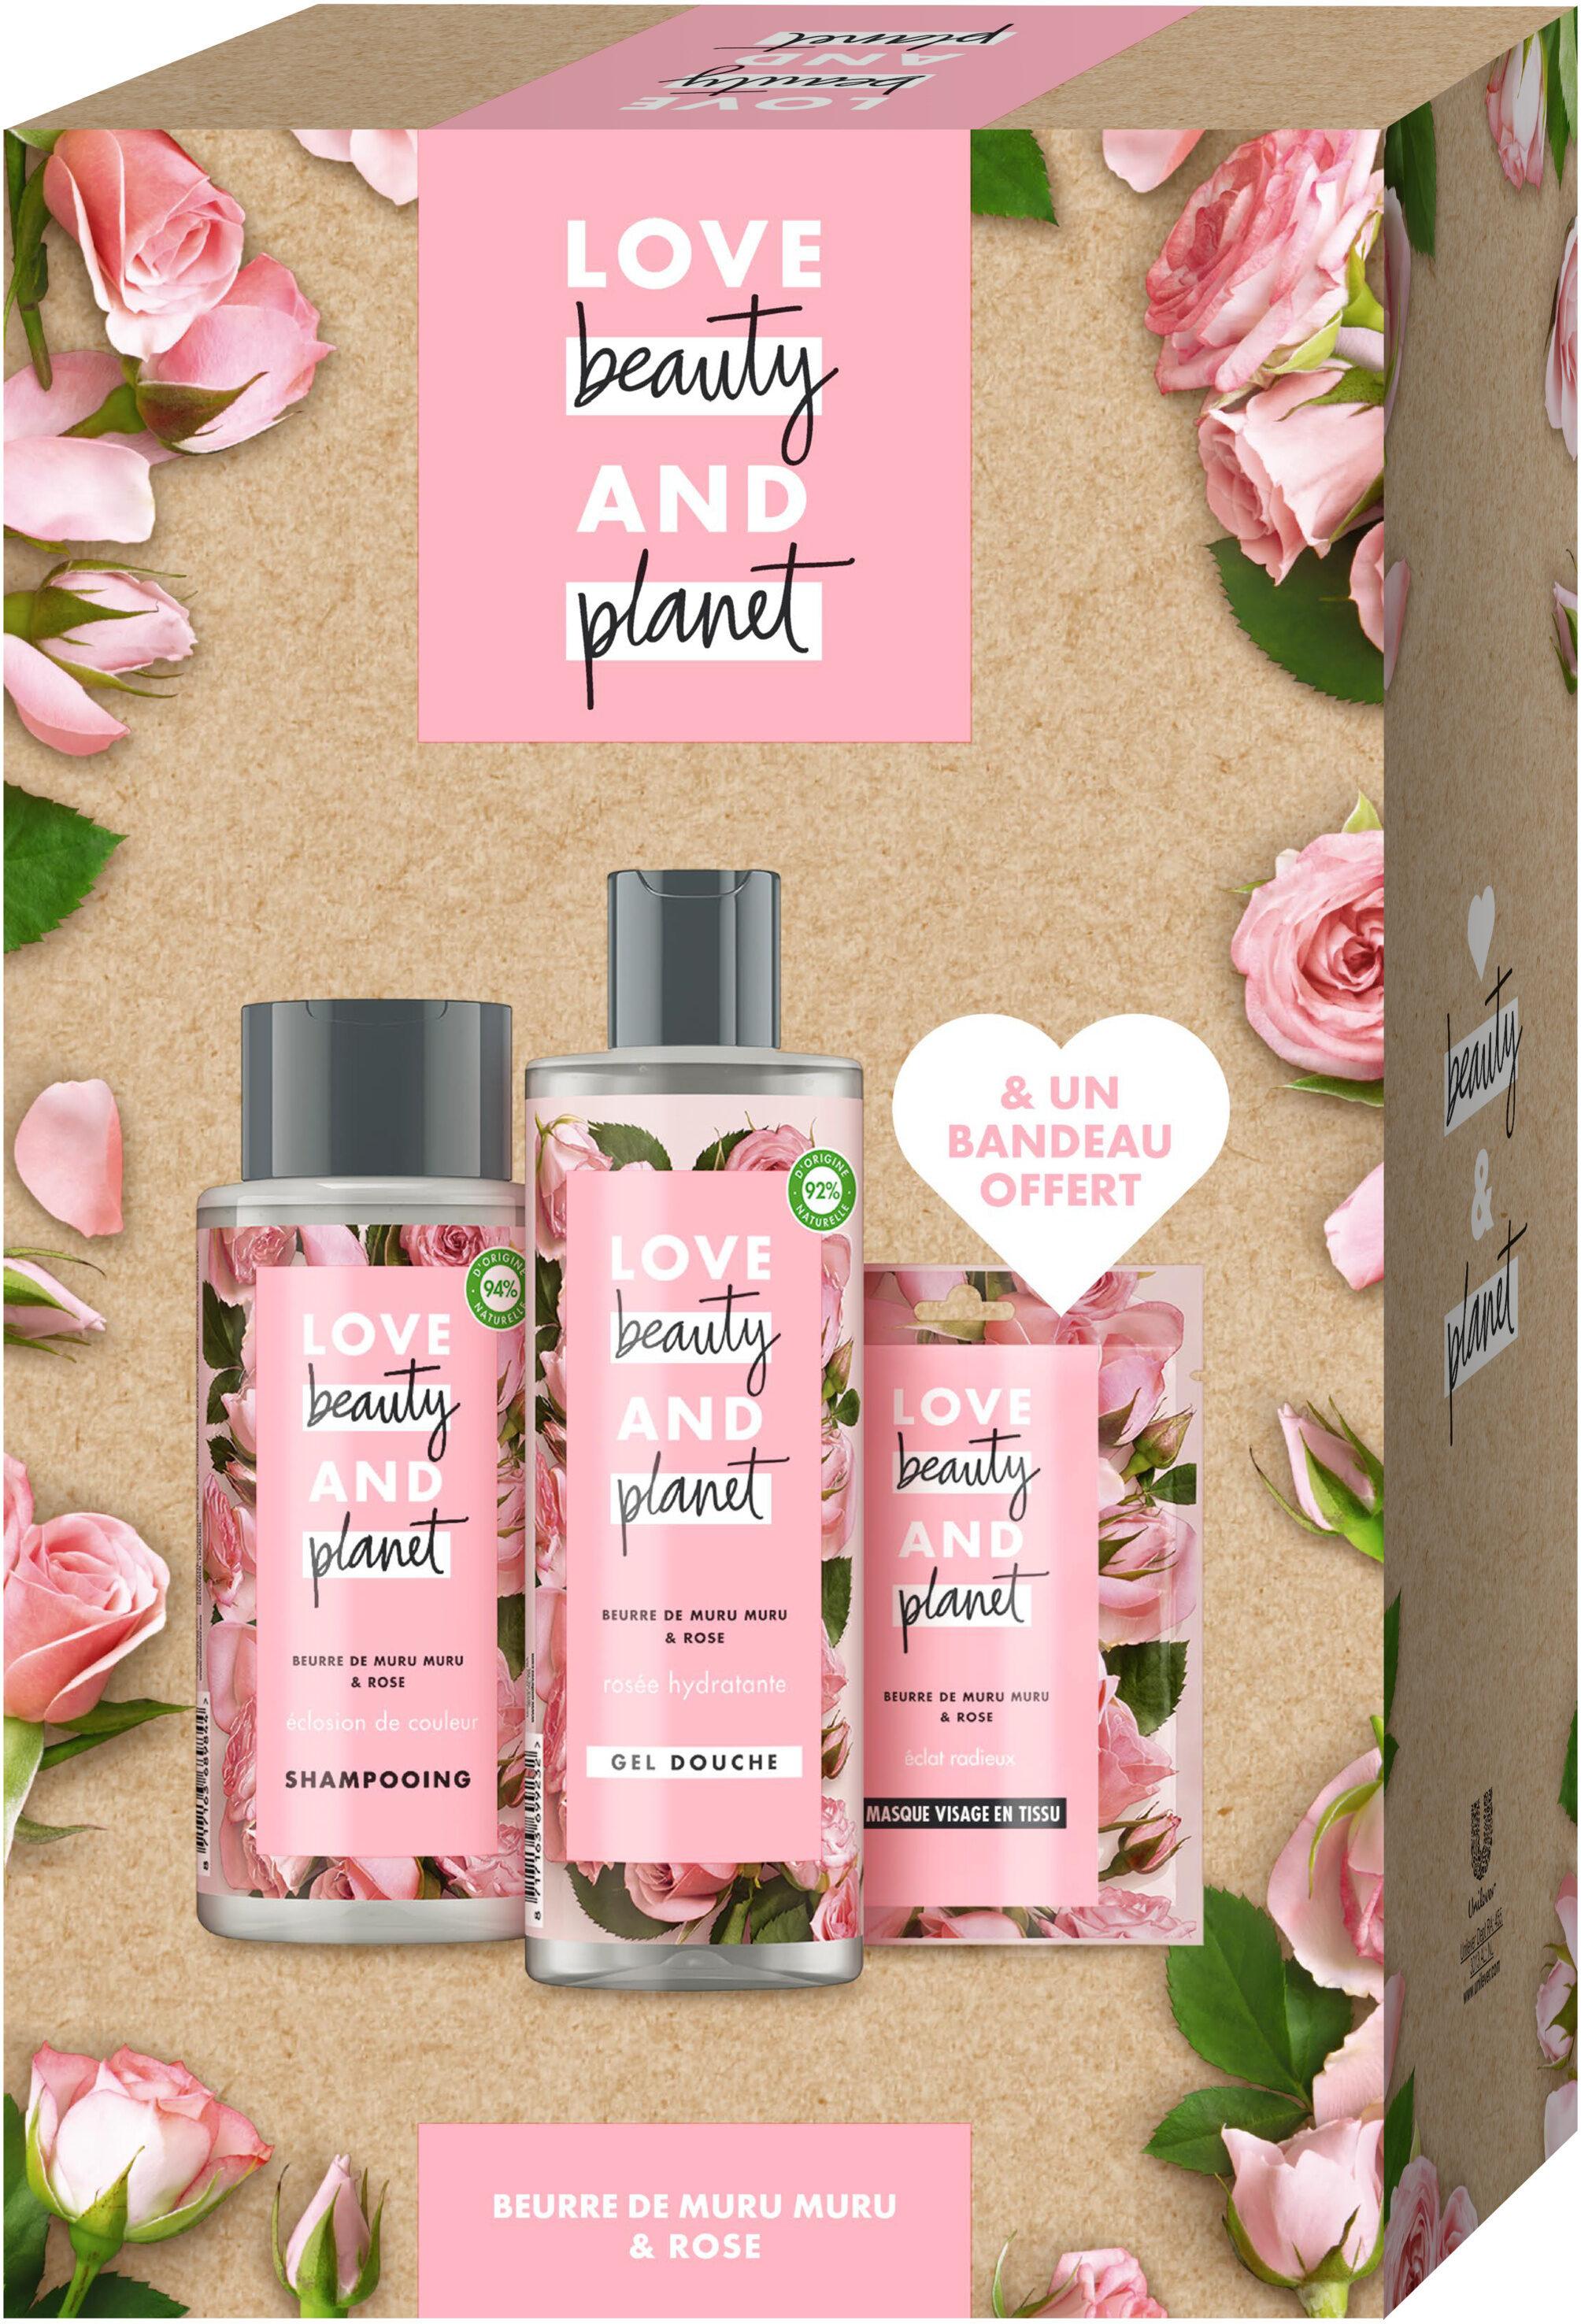 Love Beauty And Planet Coffret Shampooing, Gel douche, Masque en Tissu Beurre de Muru Muru et Rose x1 - Product - fr